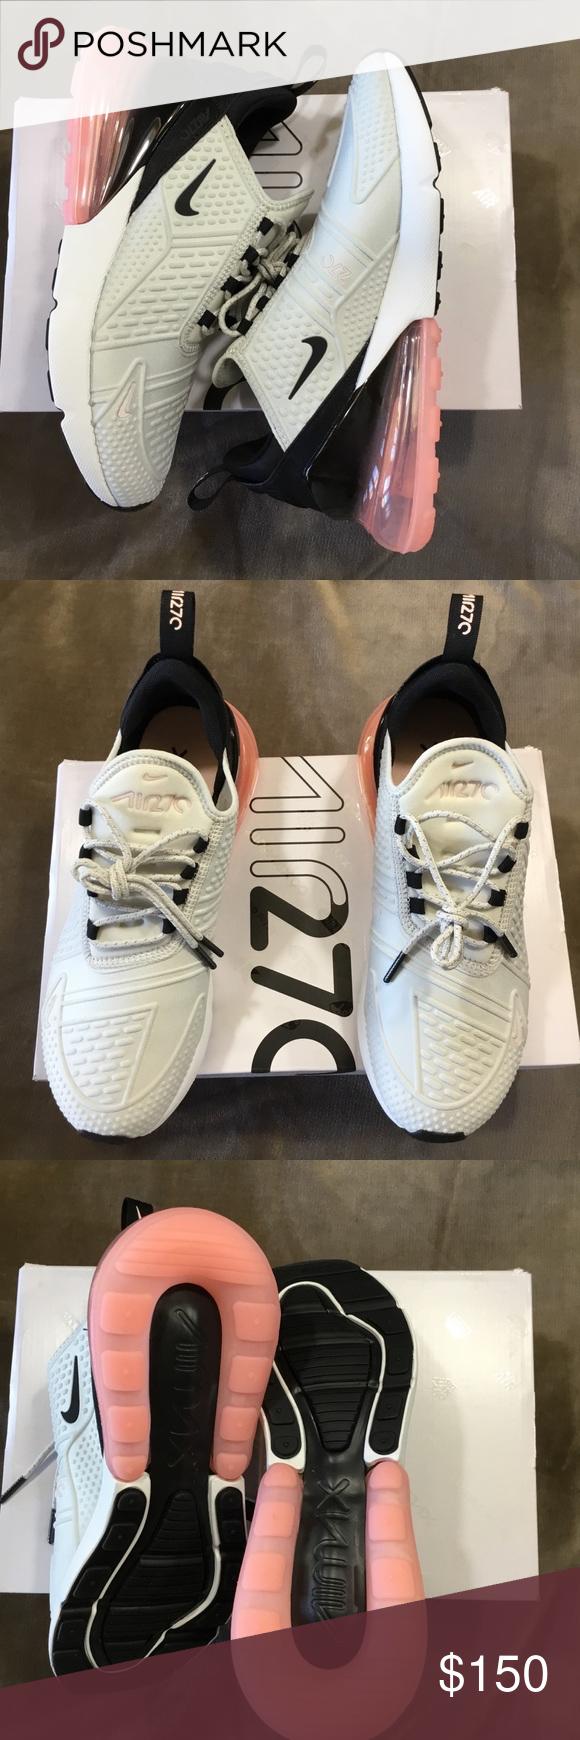 Nike Air Max 270 SE Light Bone Pink : Release date, Price & Info